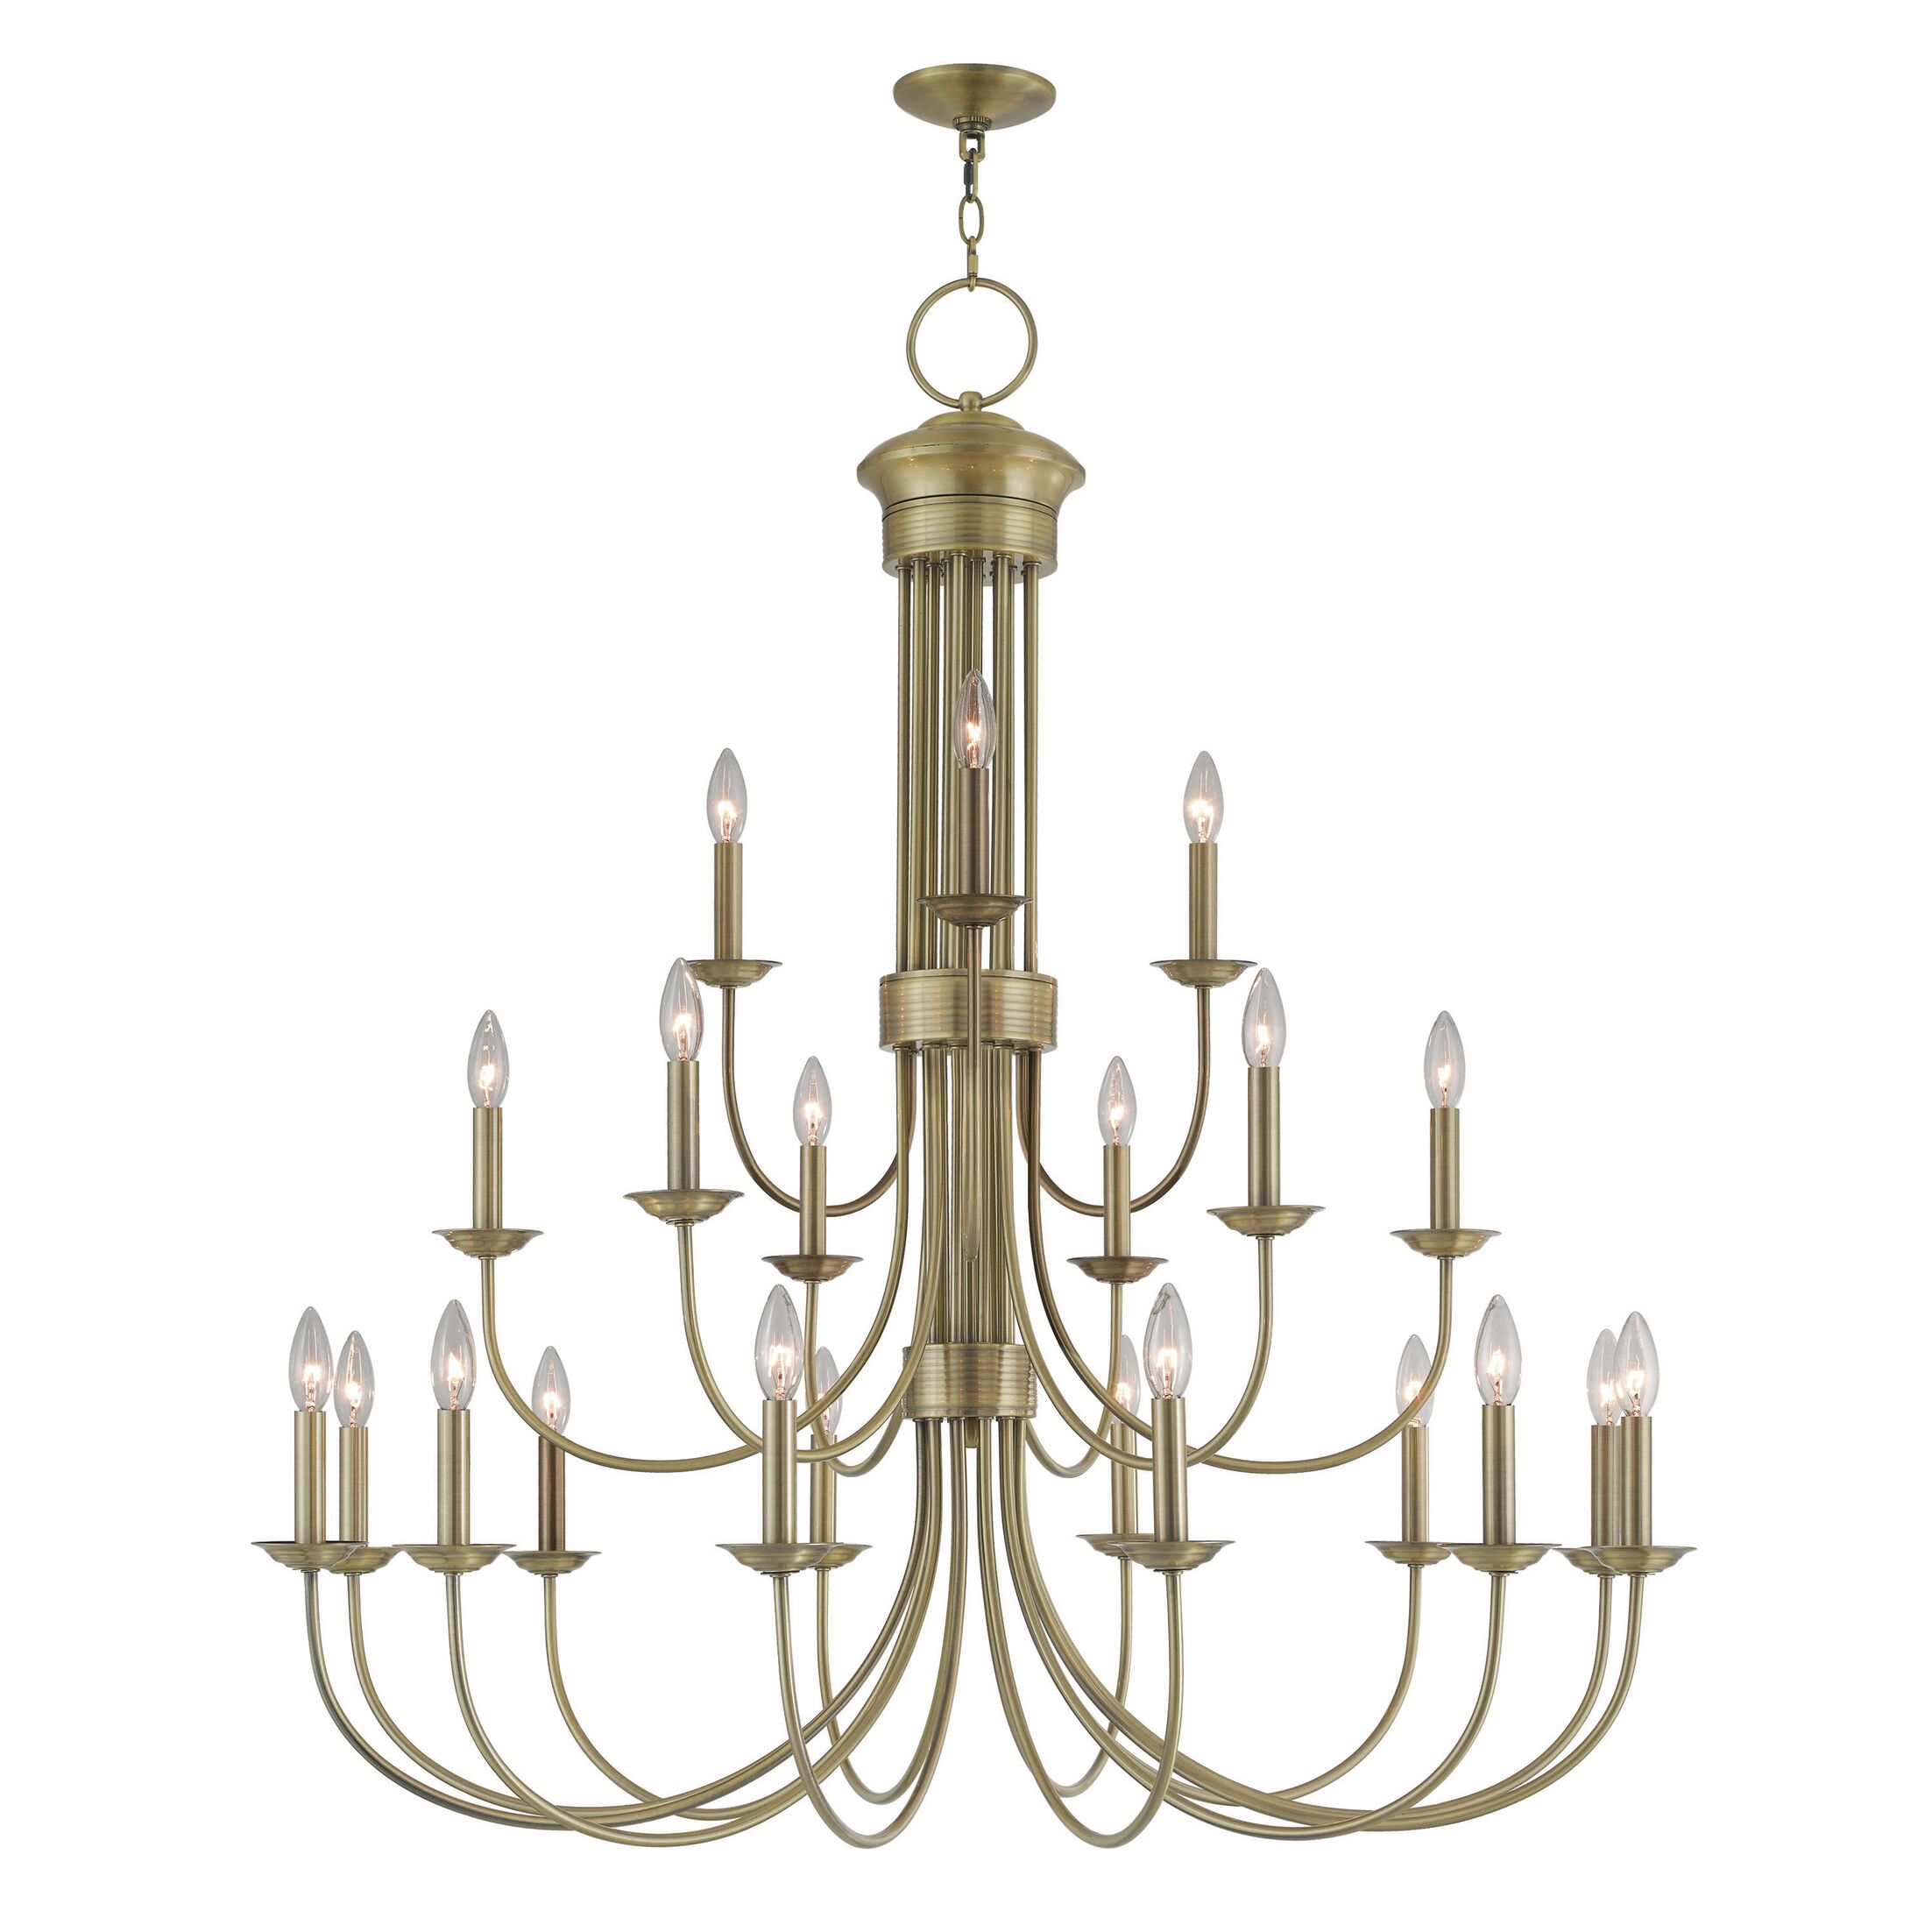 Lakemoor 22-Light Chandelier Finish: Antique Brass